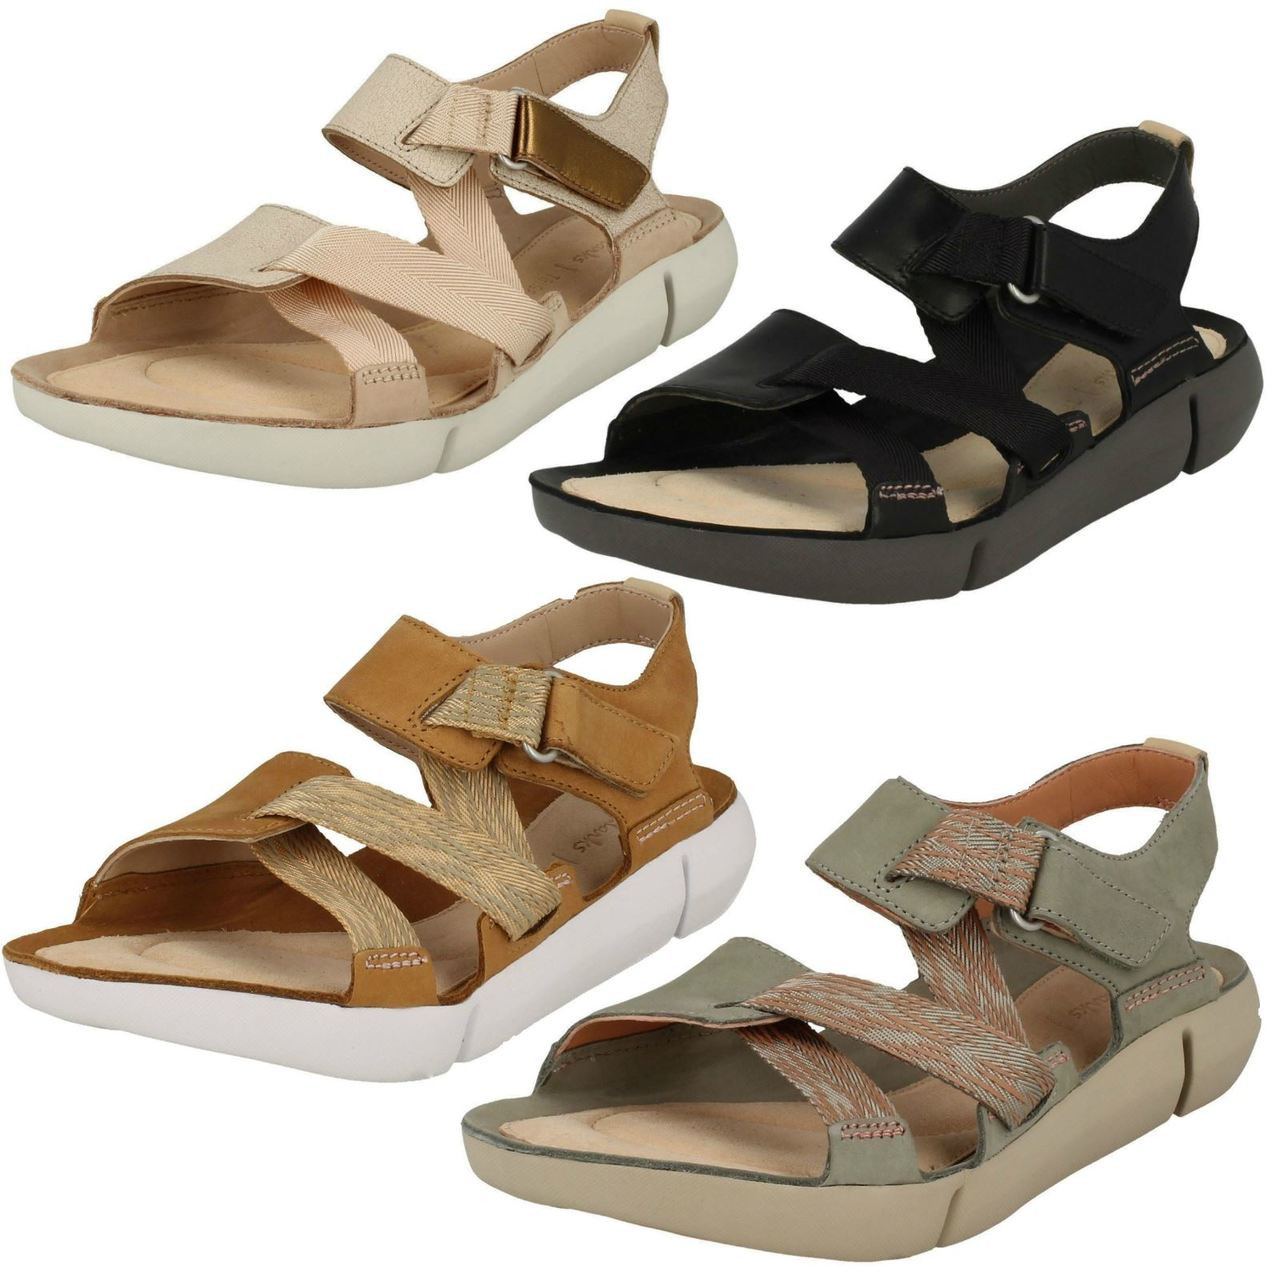 Ladies Clarks Sporty Sandals Tri Clover